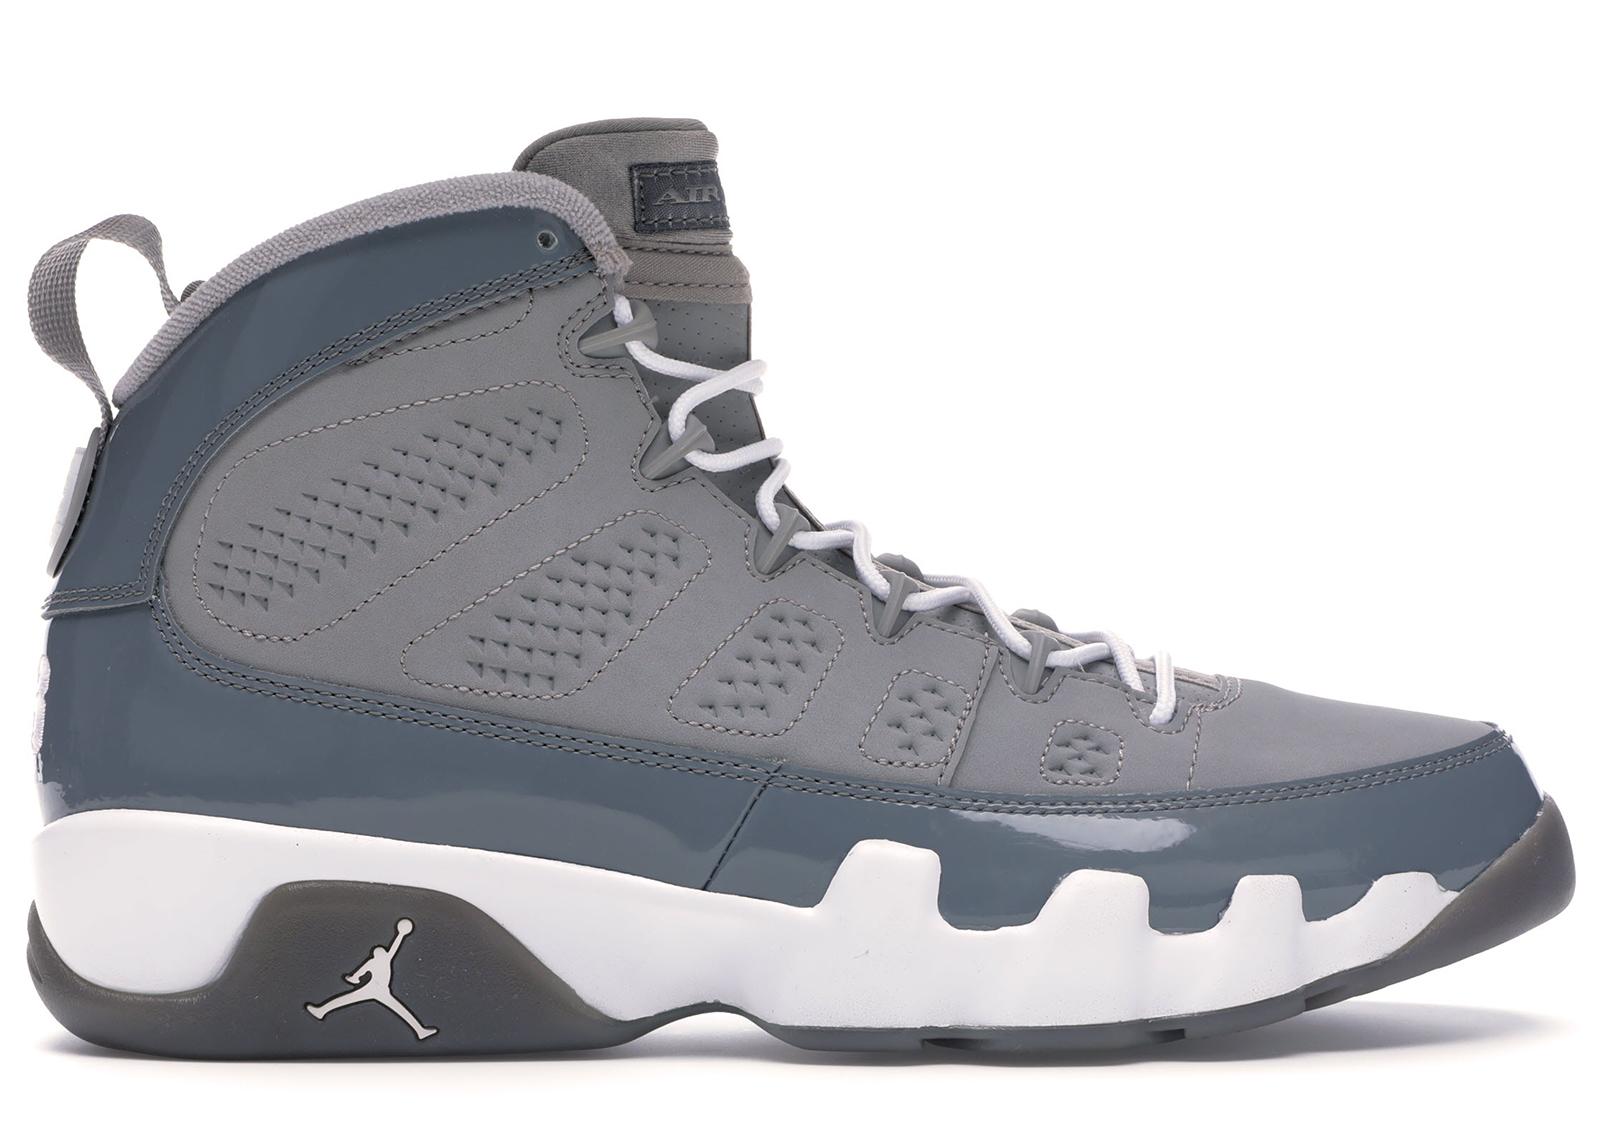 Buy Air Jordan 9 Shoes & Deadstock Sneakers